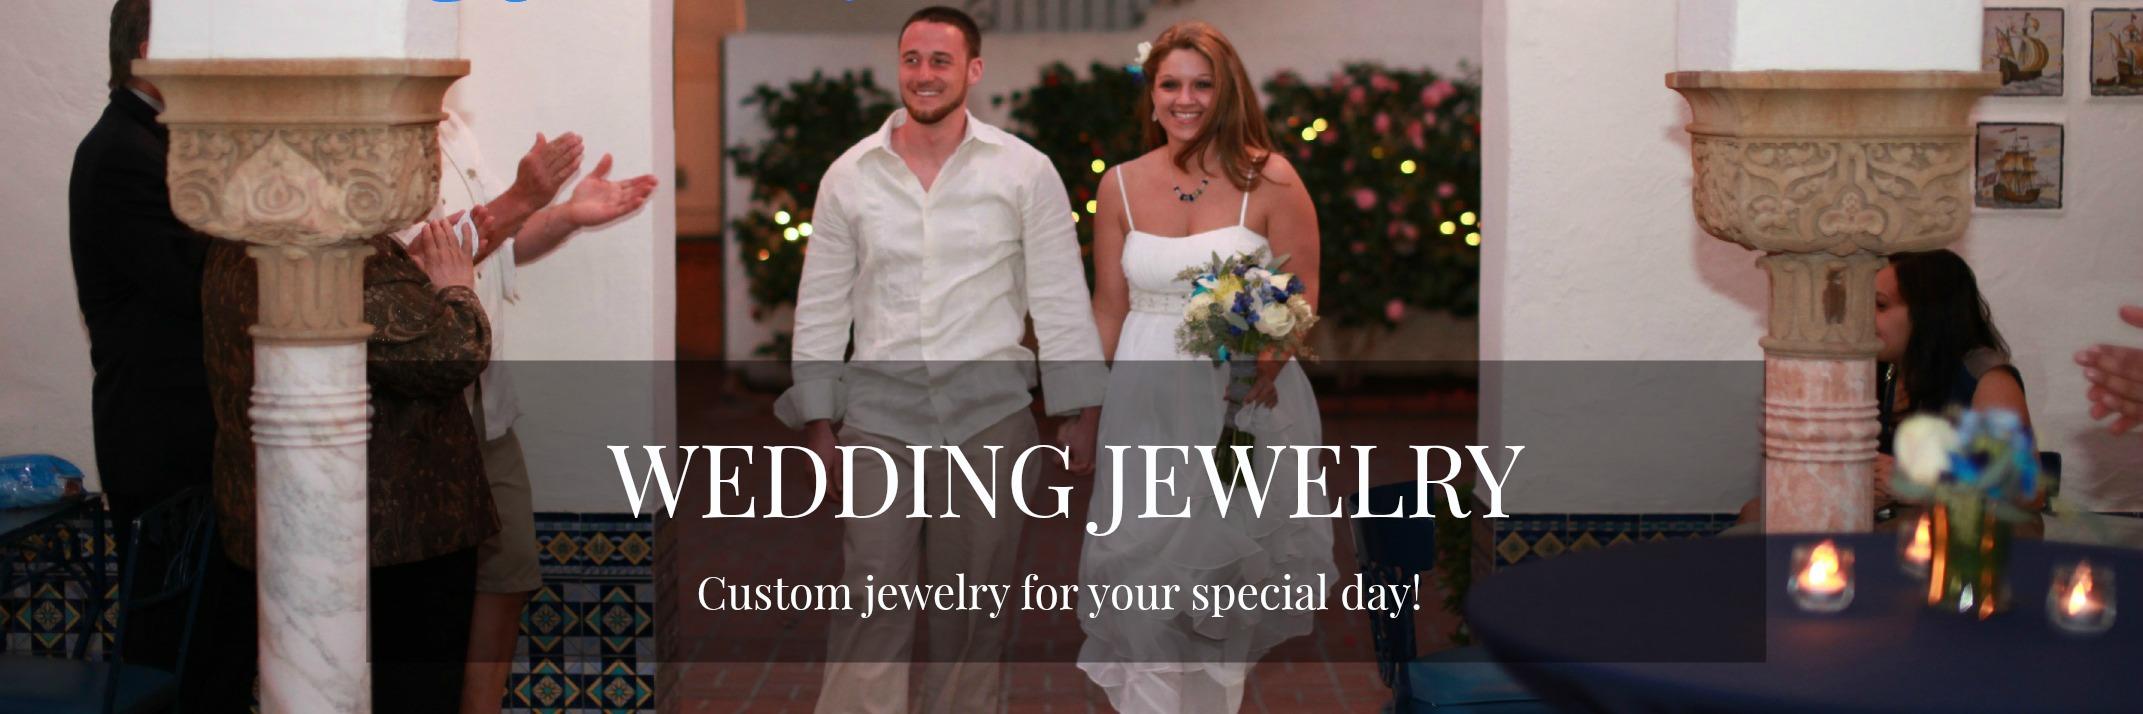 wedding-jewelry.jpg